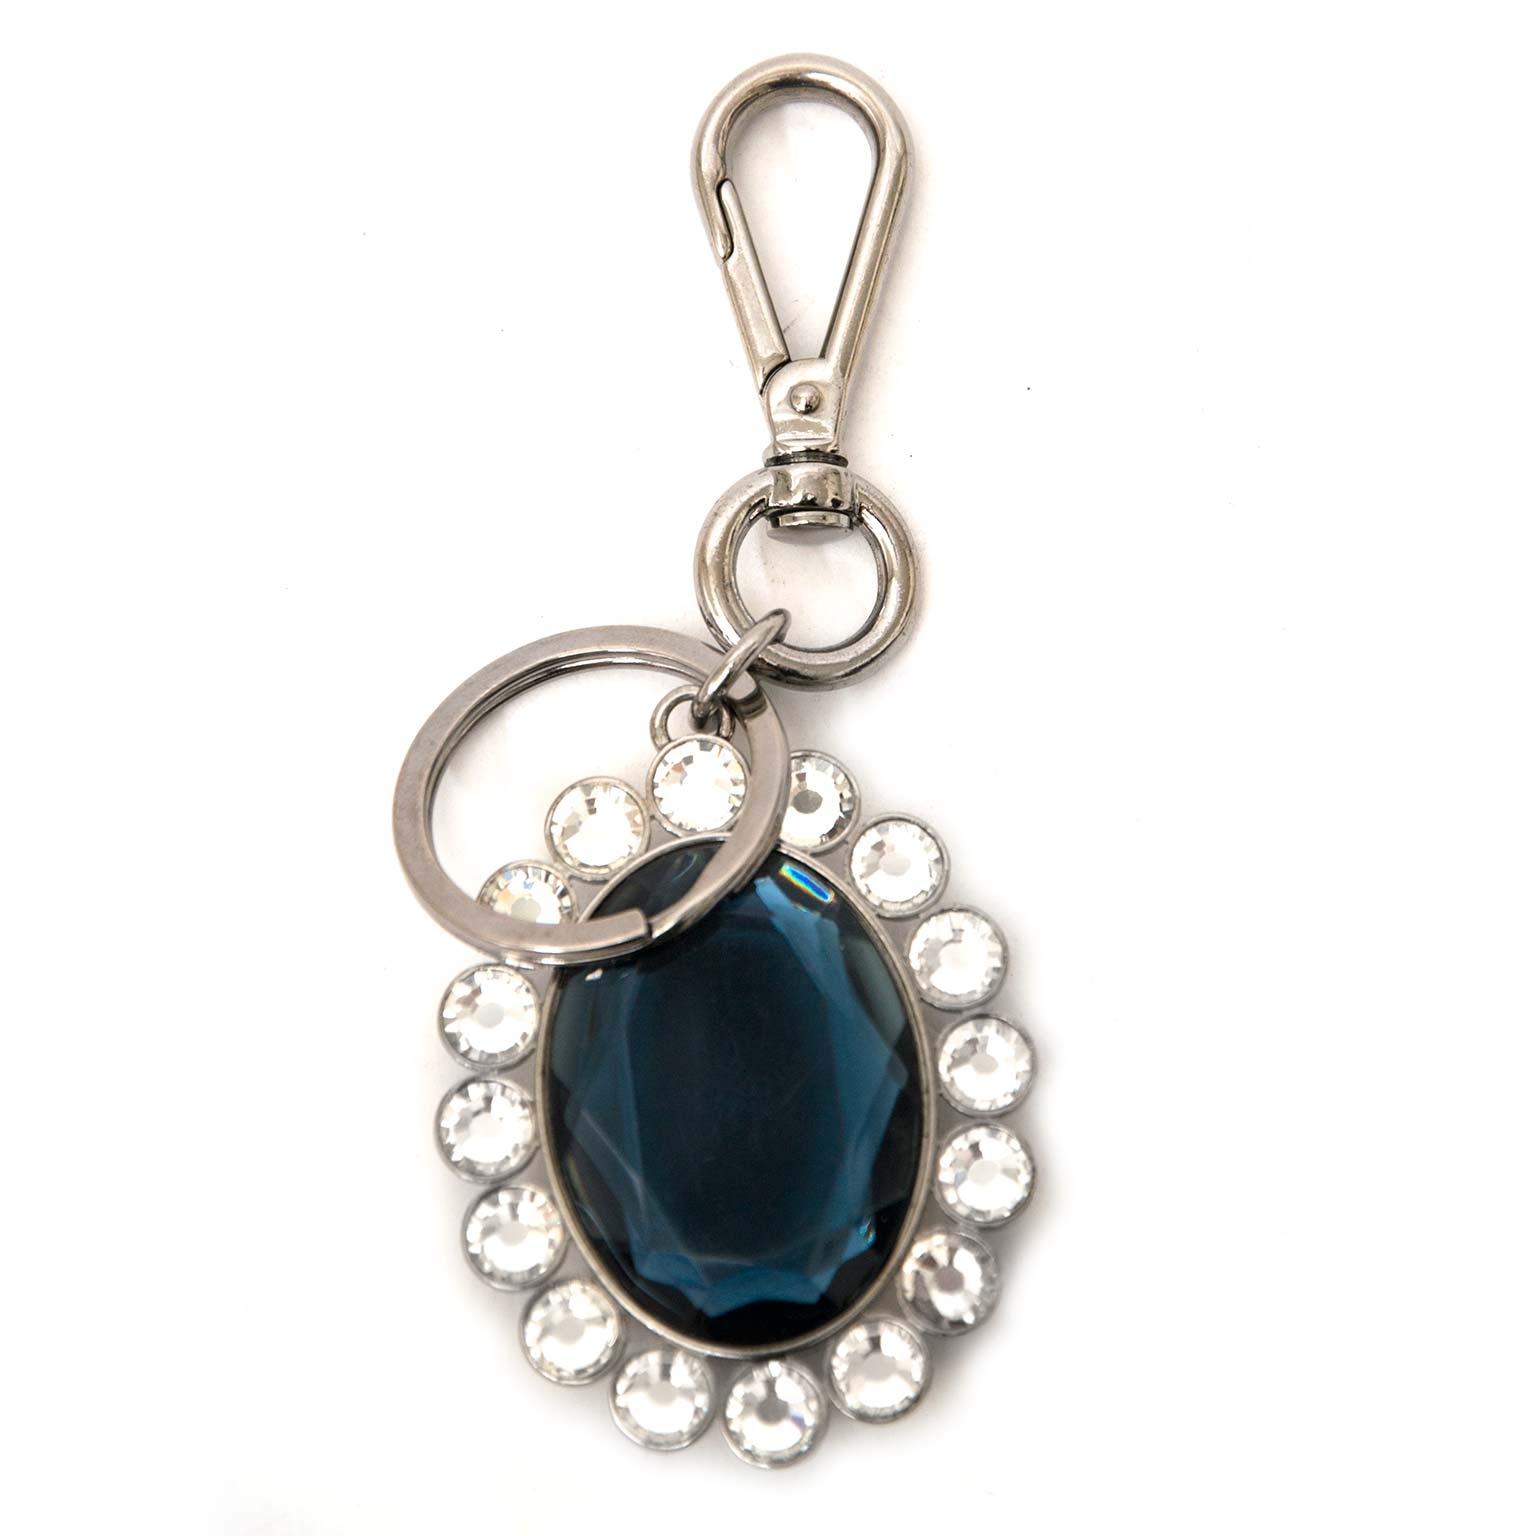 Miu Miu crystal bag charms nu online bij labellov vintage mode webshop belgië